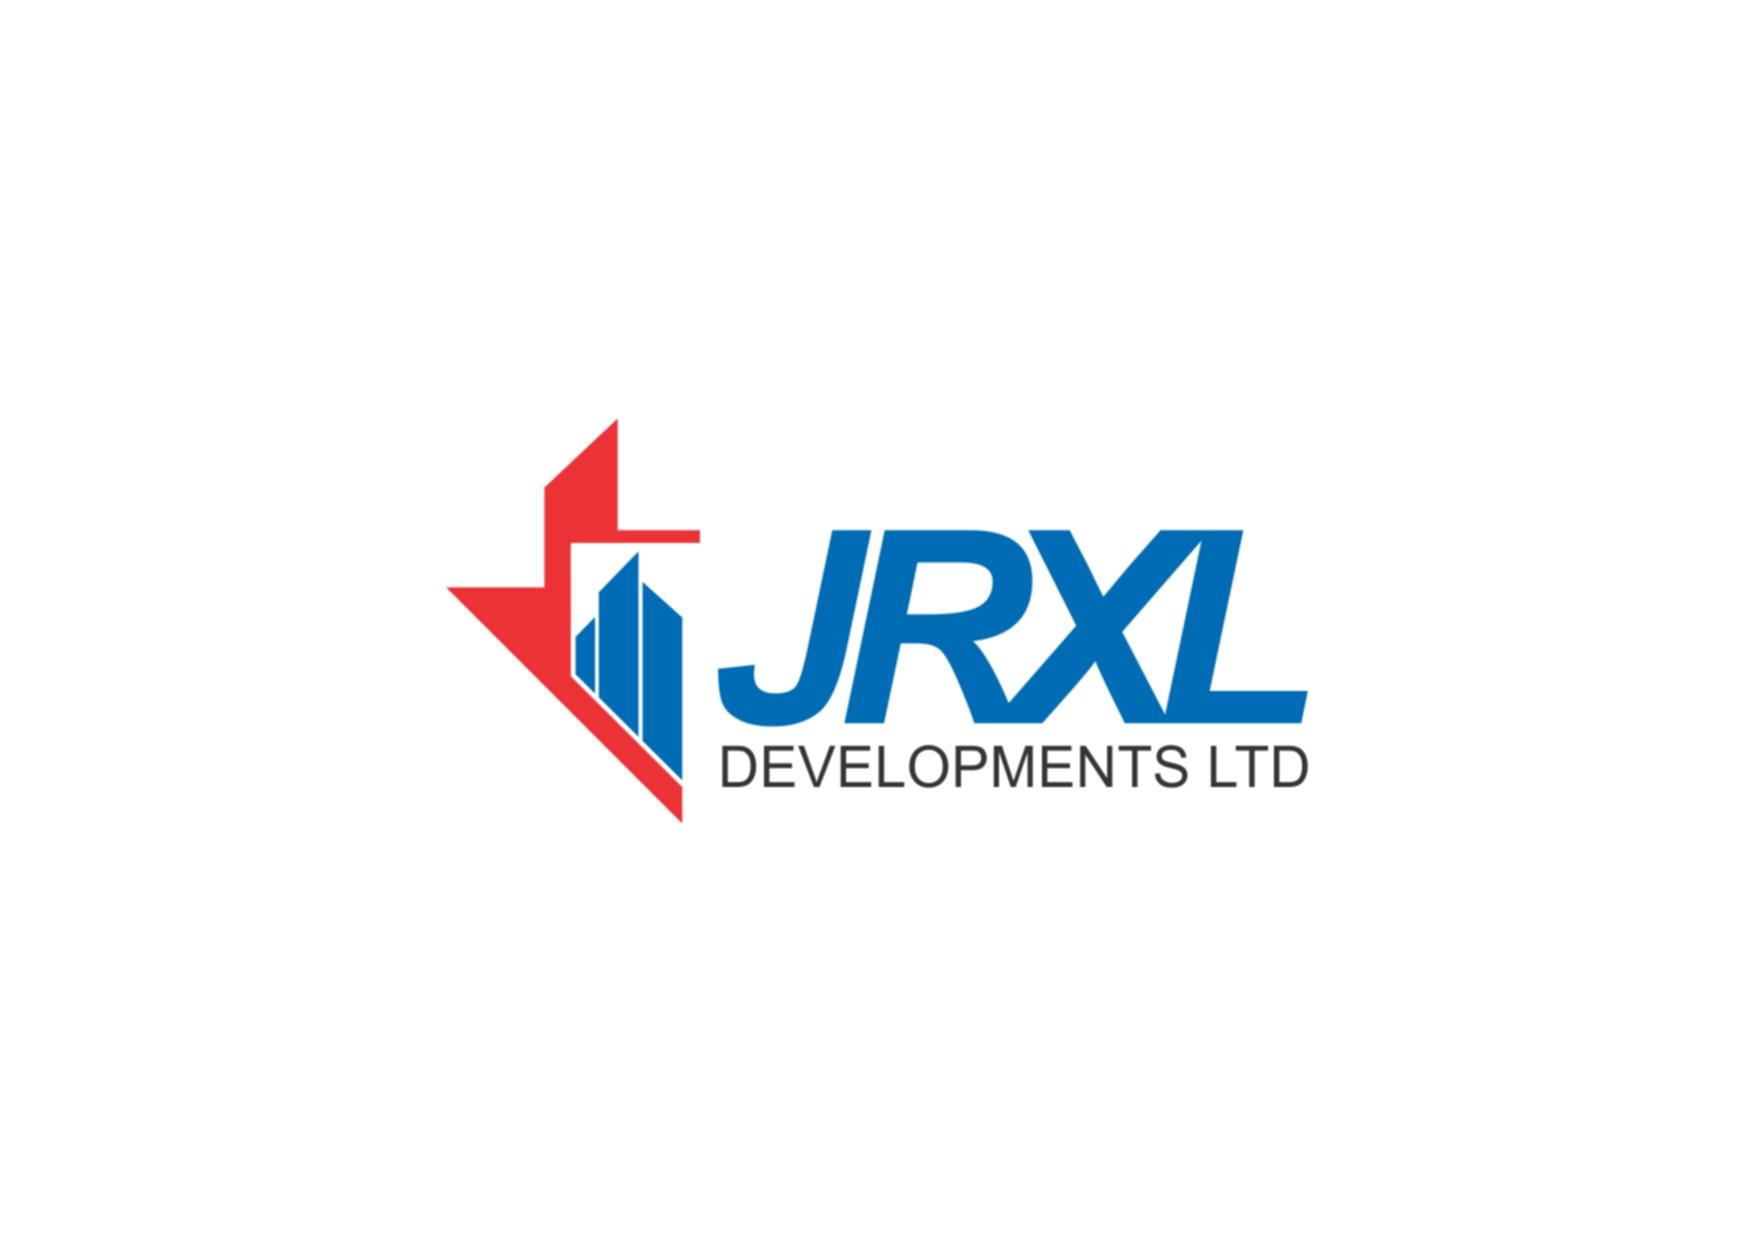 Logo Design by Private User - Entry No. 56 in the Logo Design Contest JRXL DEVELOPMENTS LTD Logo Design.